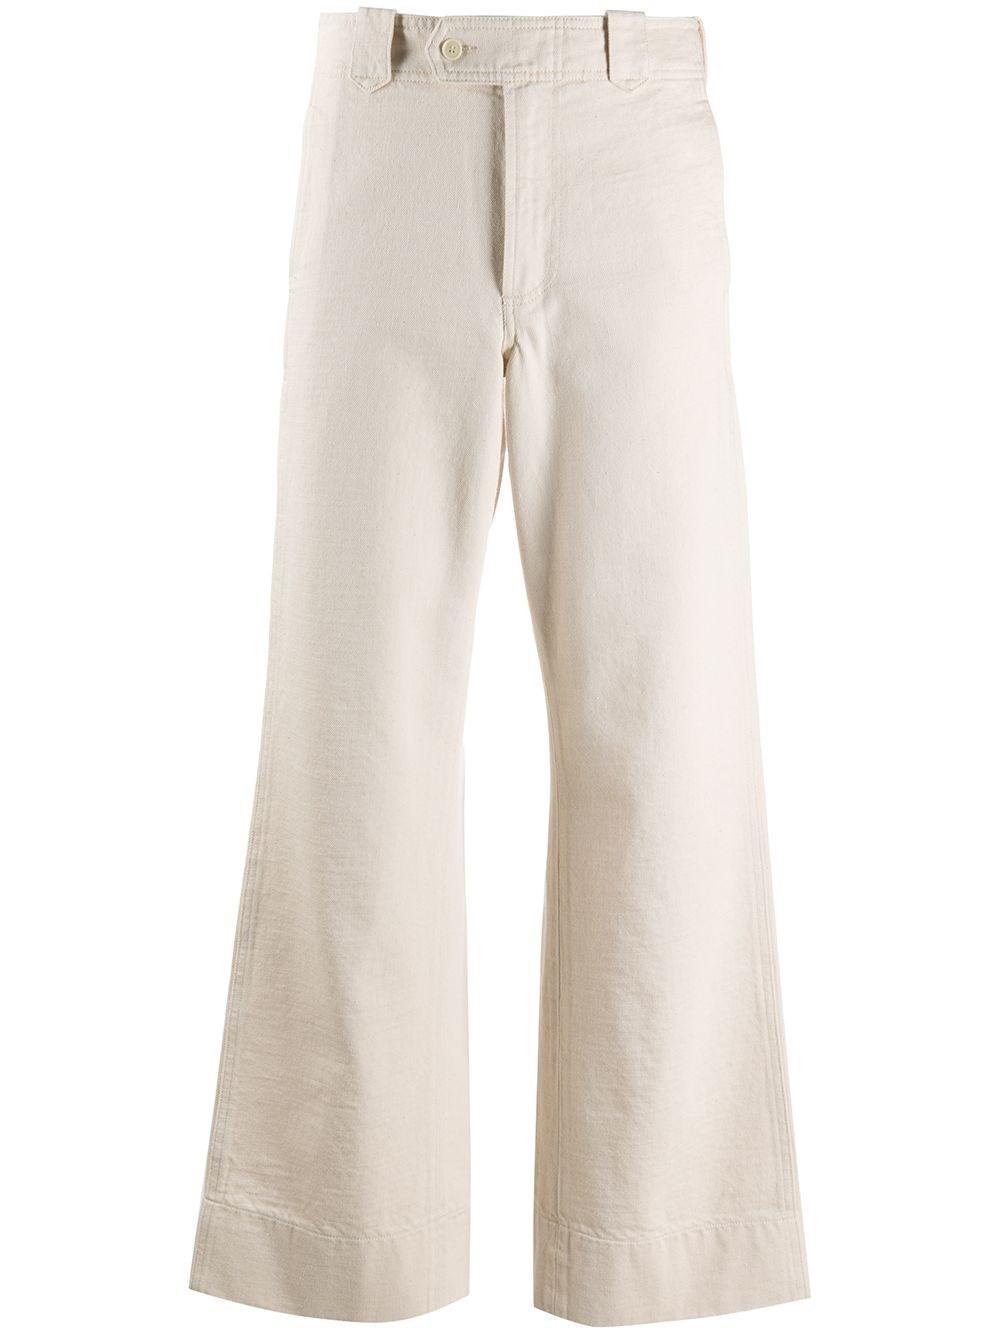 BARENA VENEZIA High-Rise Wide-Leg Jeans